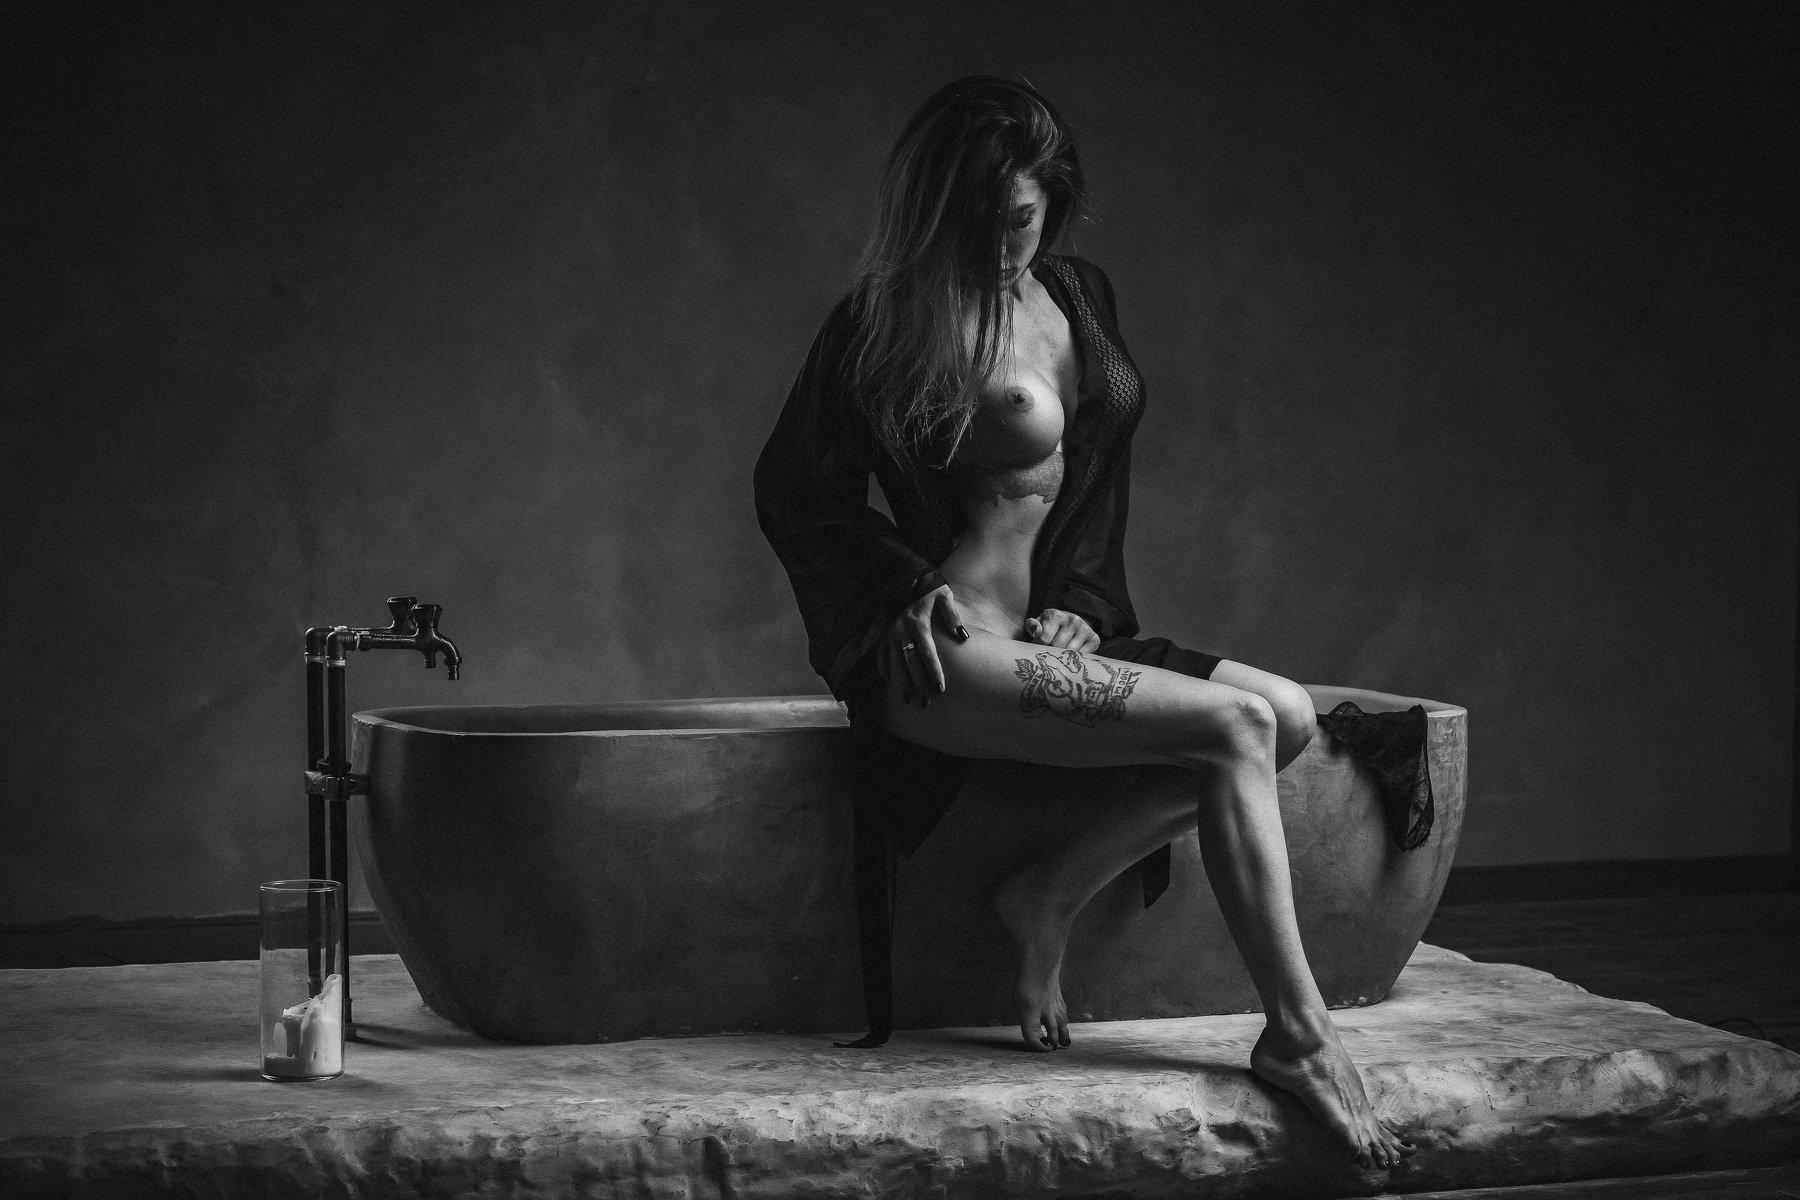 girl topless bath nude, Пистолетов Илья